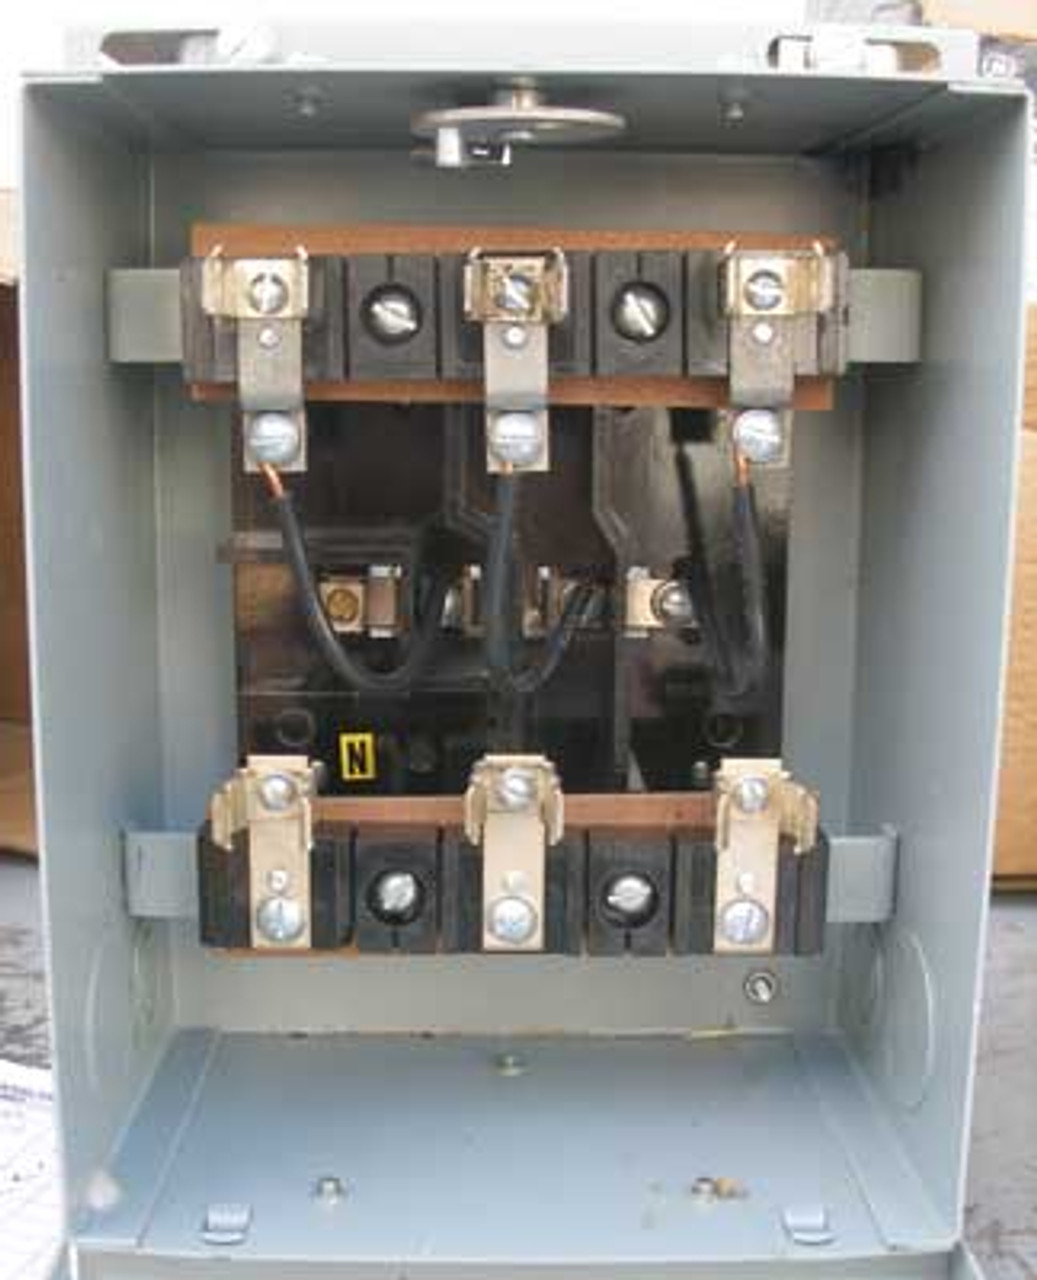 GE DFPB461 Bus Plug Flex-A-Plug 30 Amp 600VAC 4 Pole - New